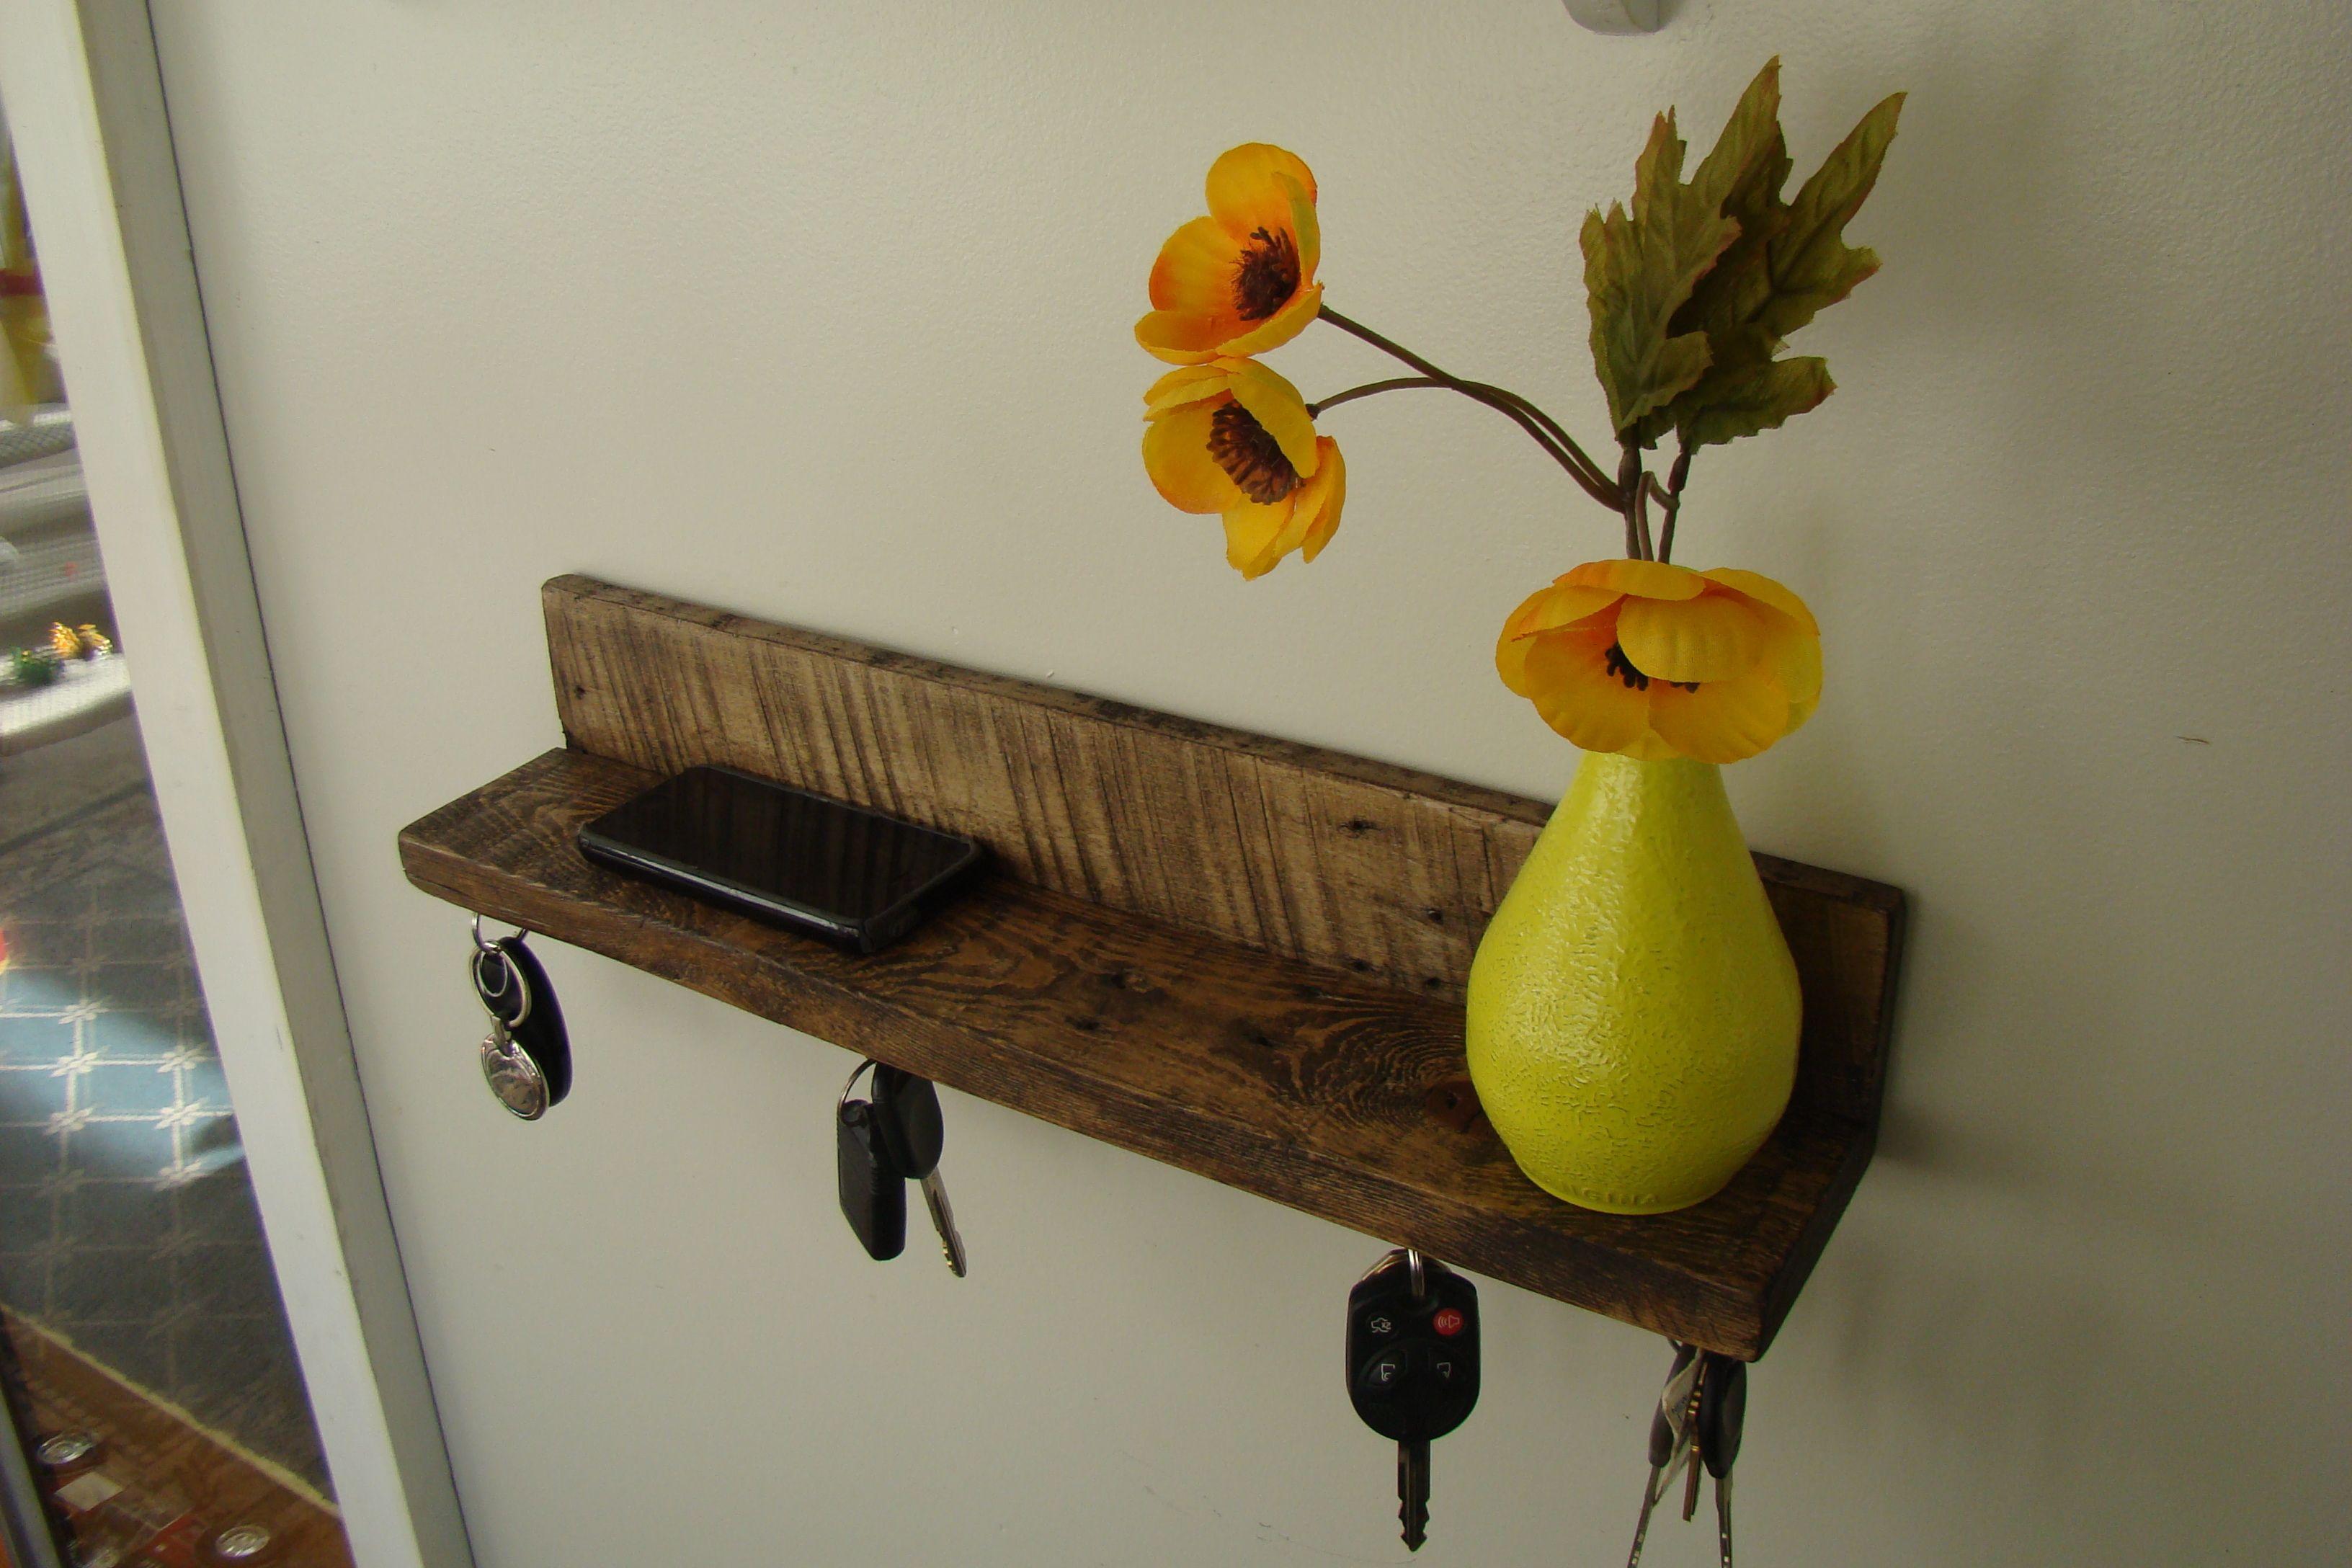 Reclaimed Wood Rustic Shelf and Magnetic Key